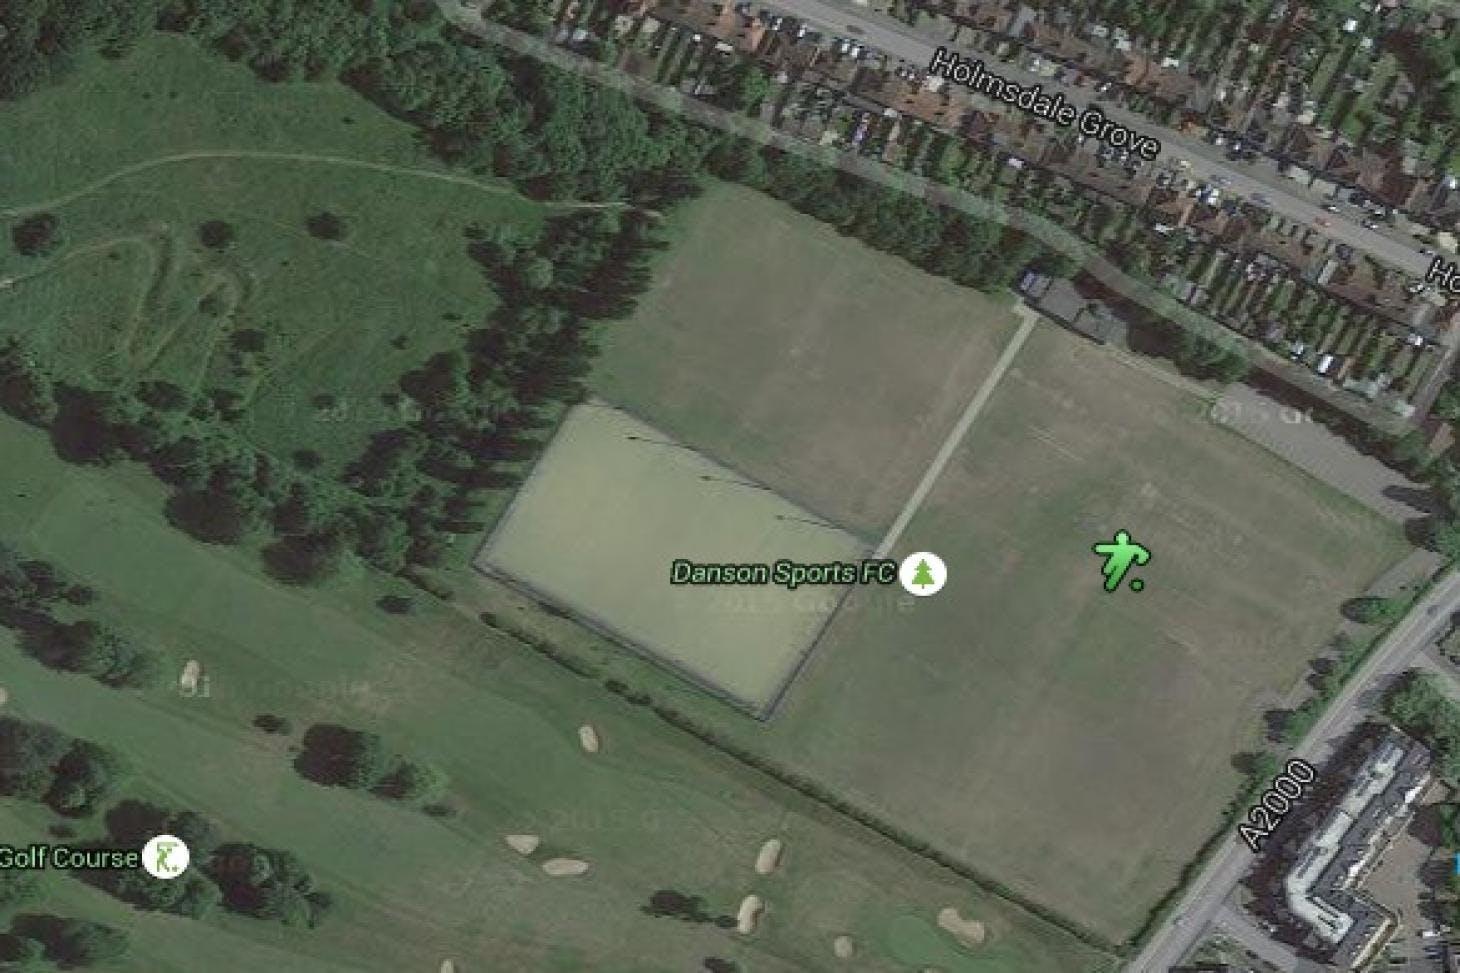 Mayplace Recreation Ground (Danson Sports Football Club) Full size | Grass cricket facilities